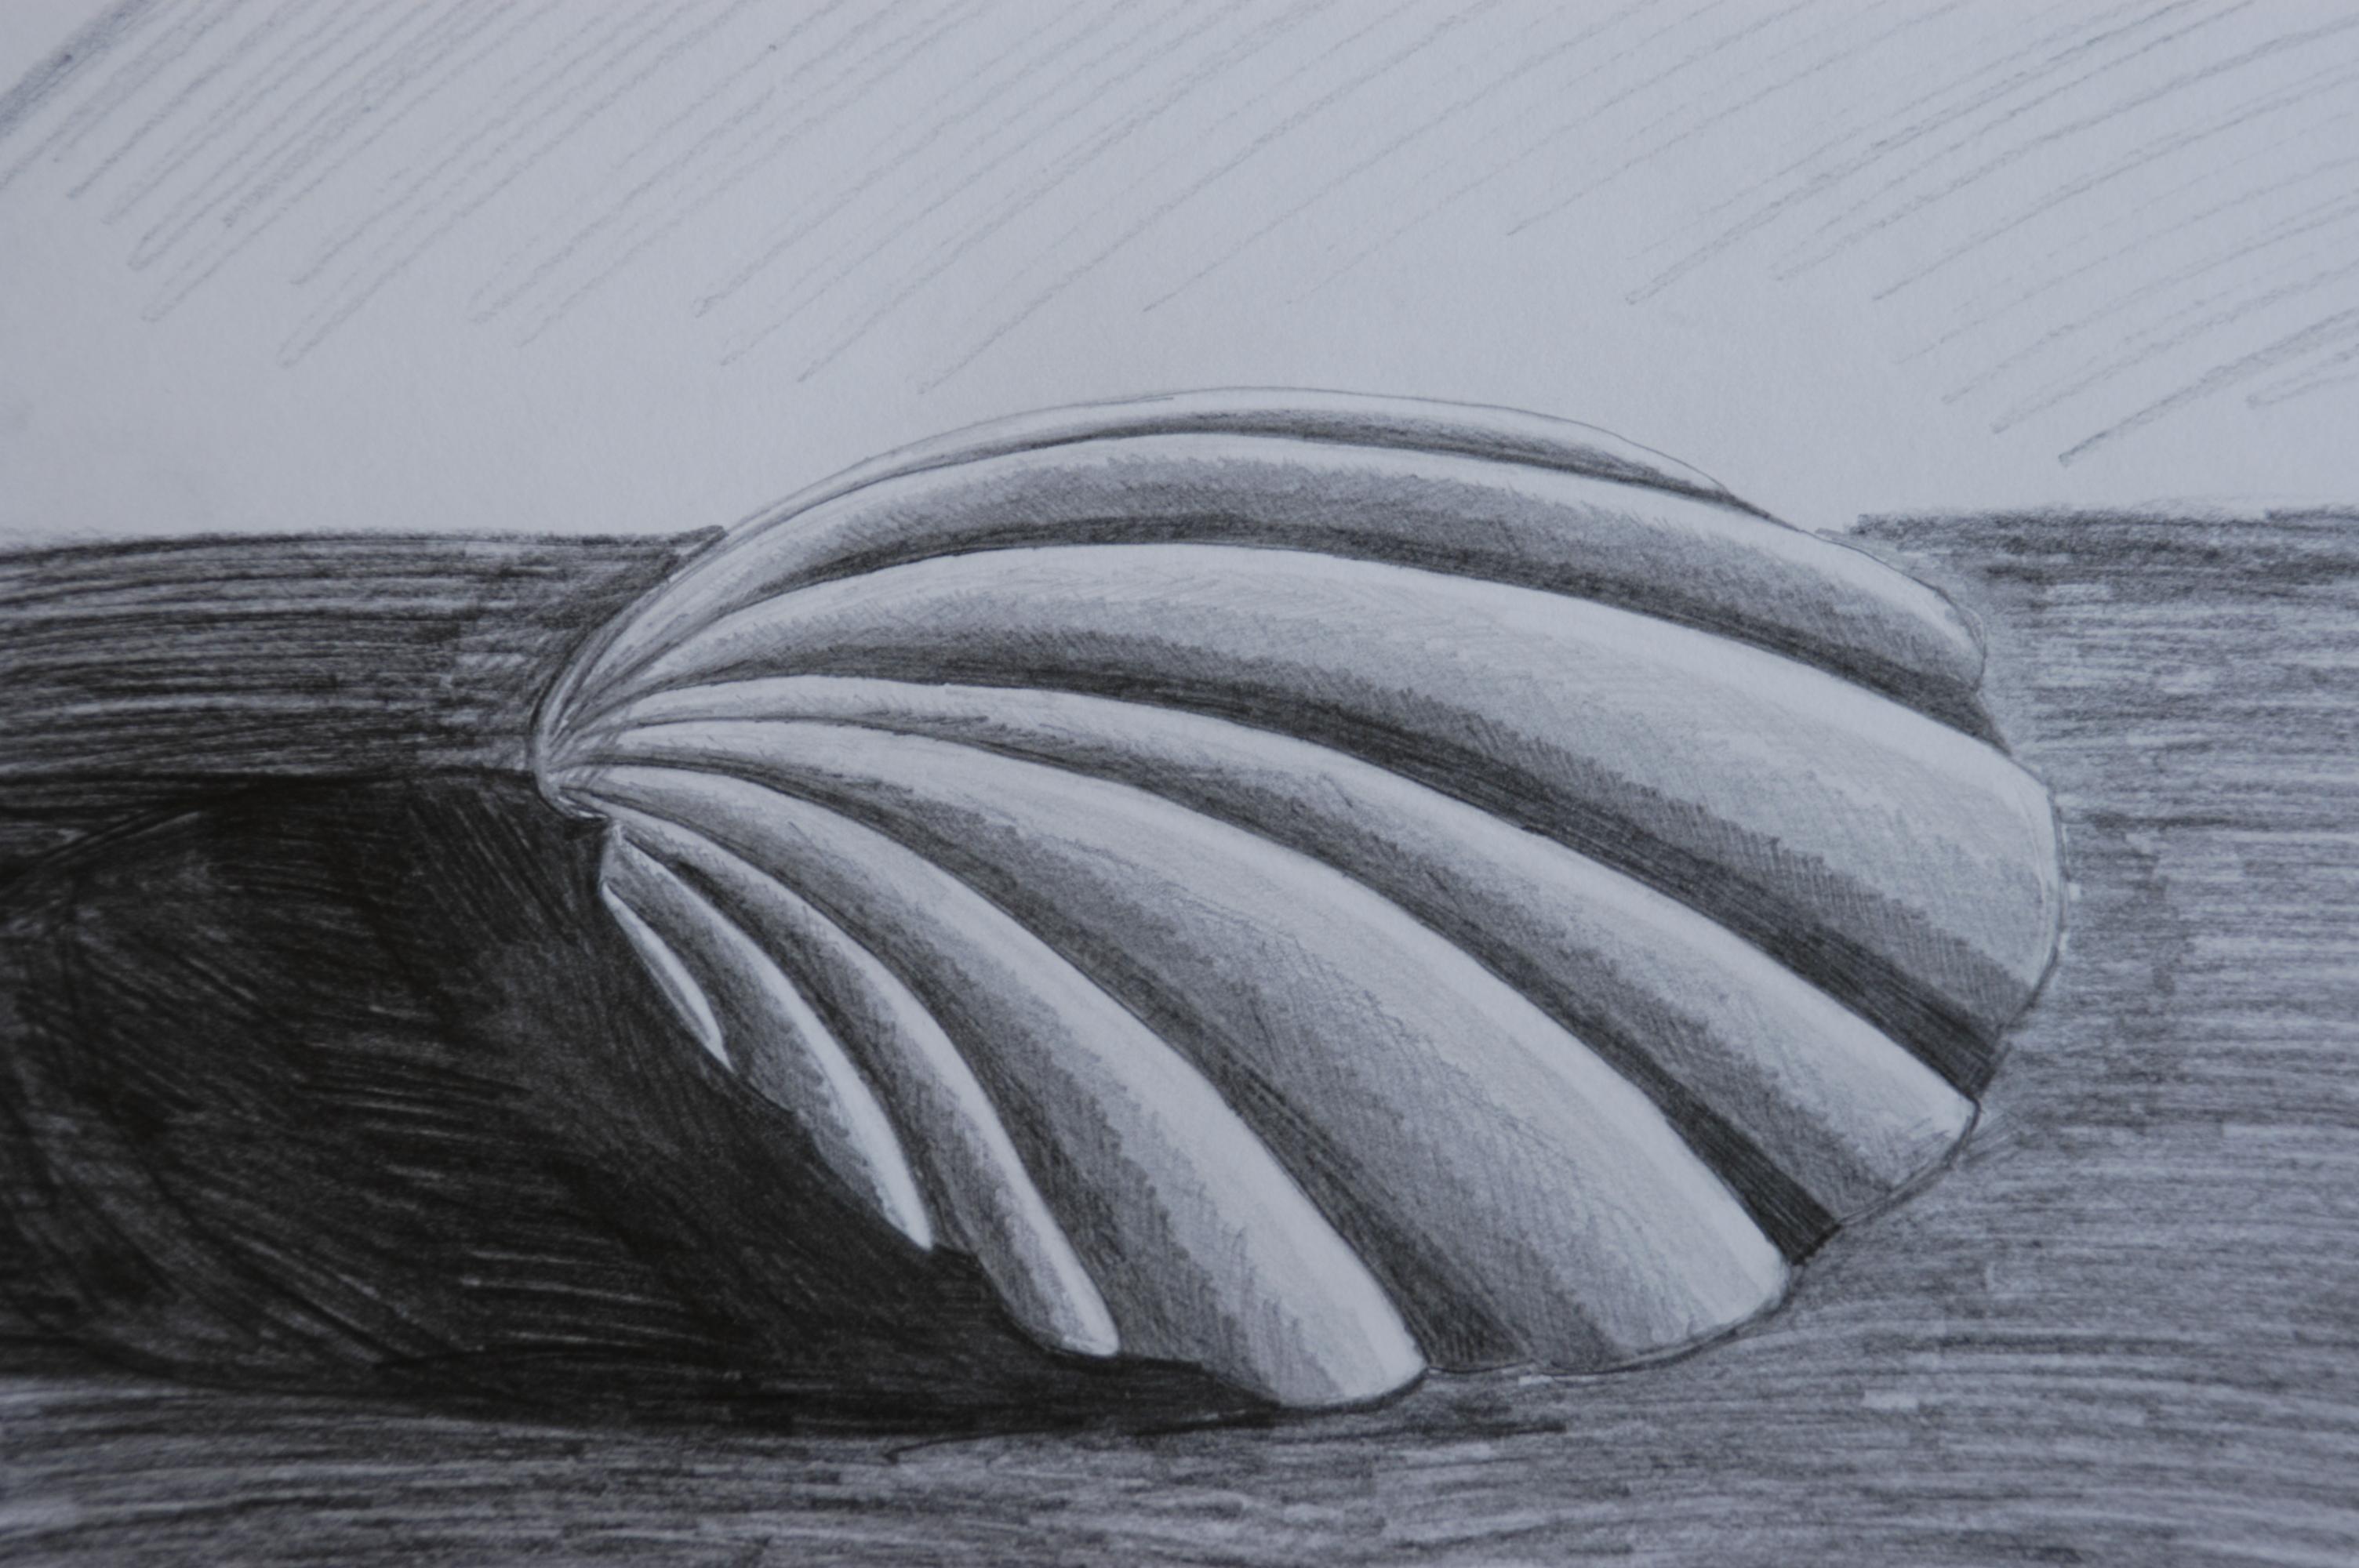 Drawn shell tonal 1 – tone learning Getting